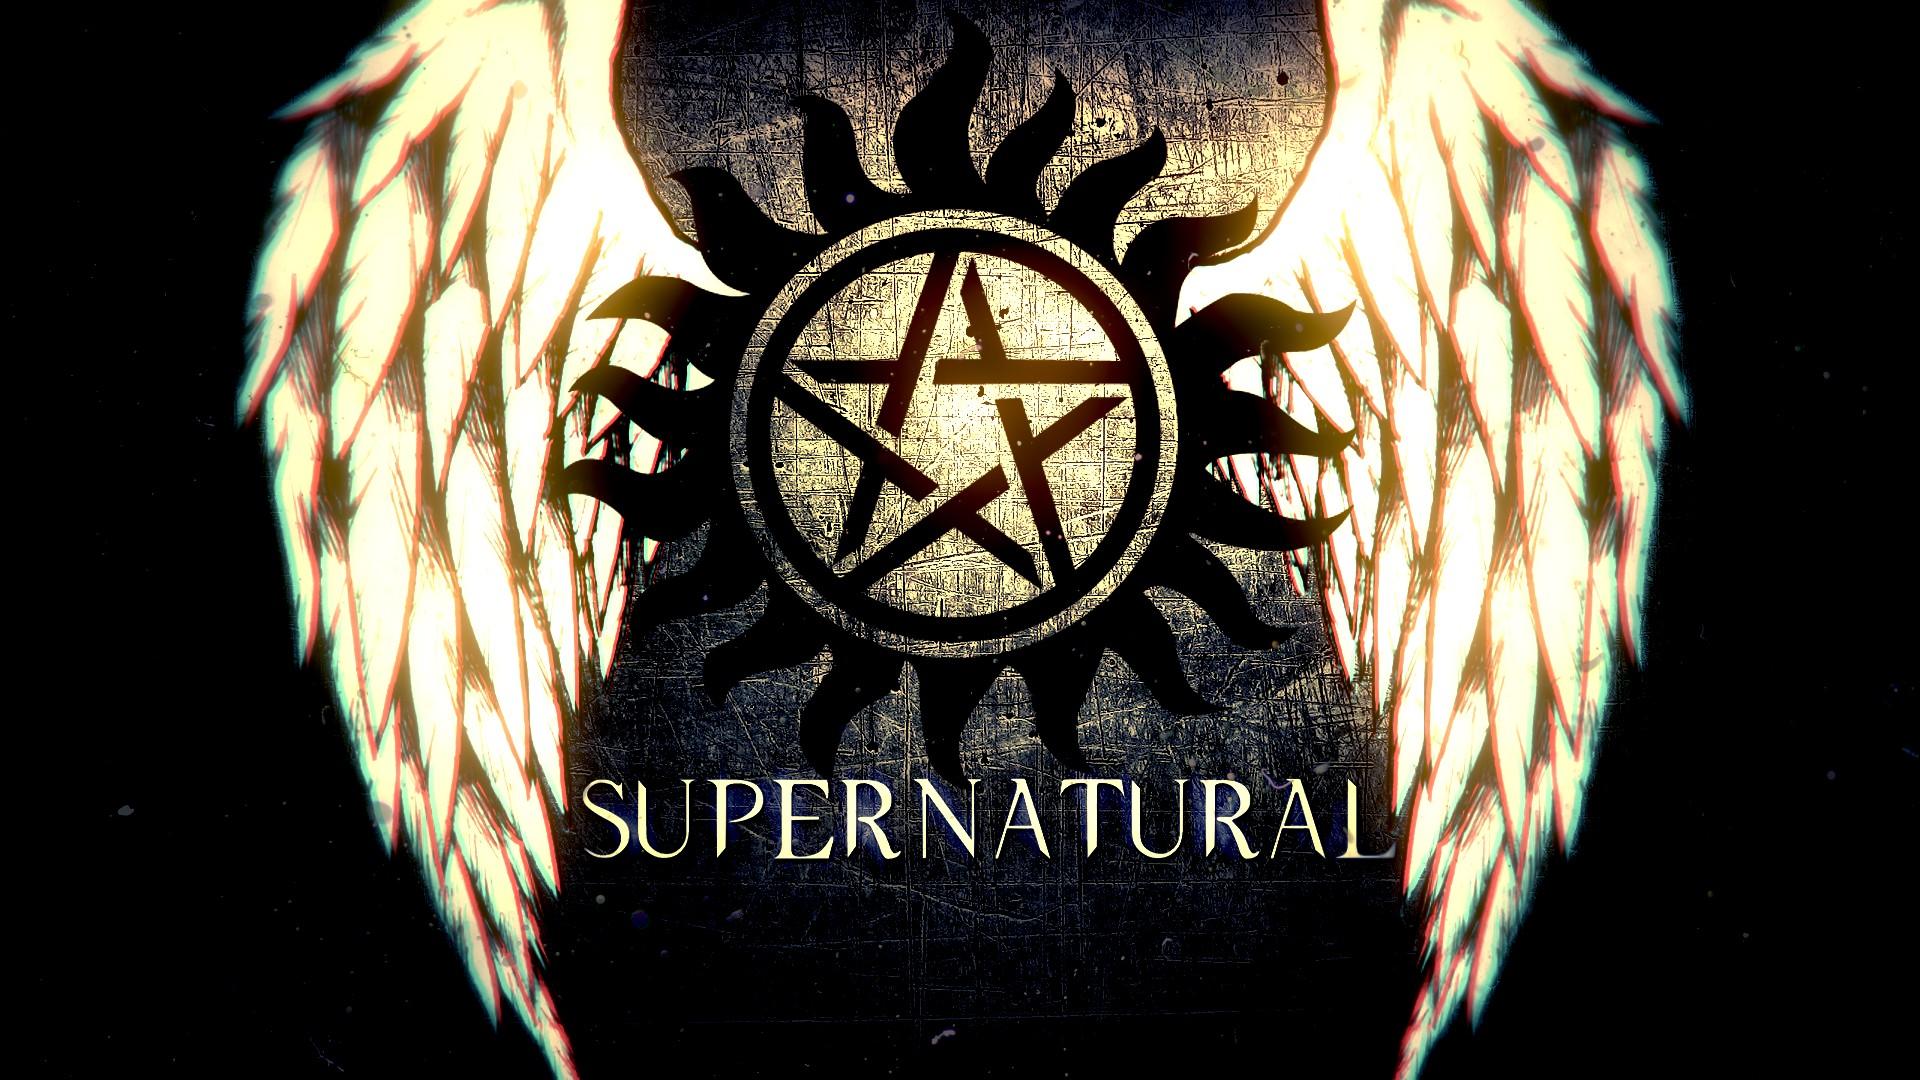 Must see Wallpaper Logo Supernatural - 149705-Supernatural-wings  Picture_279512.jpg